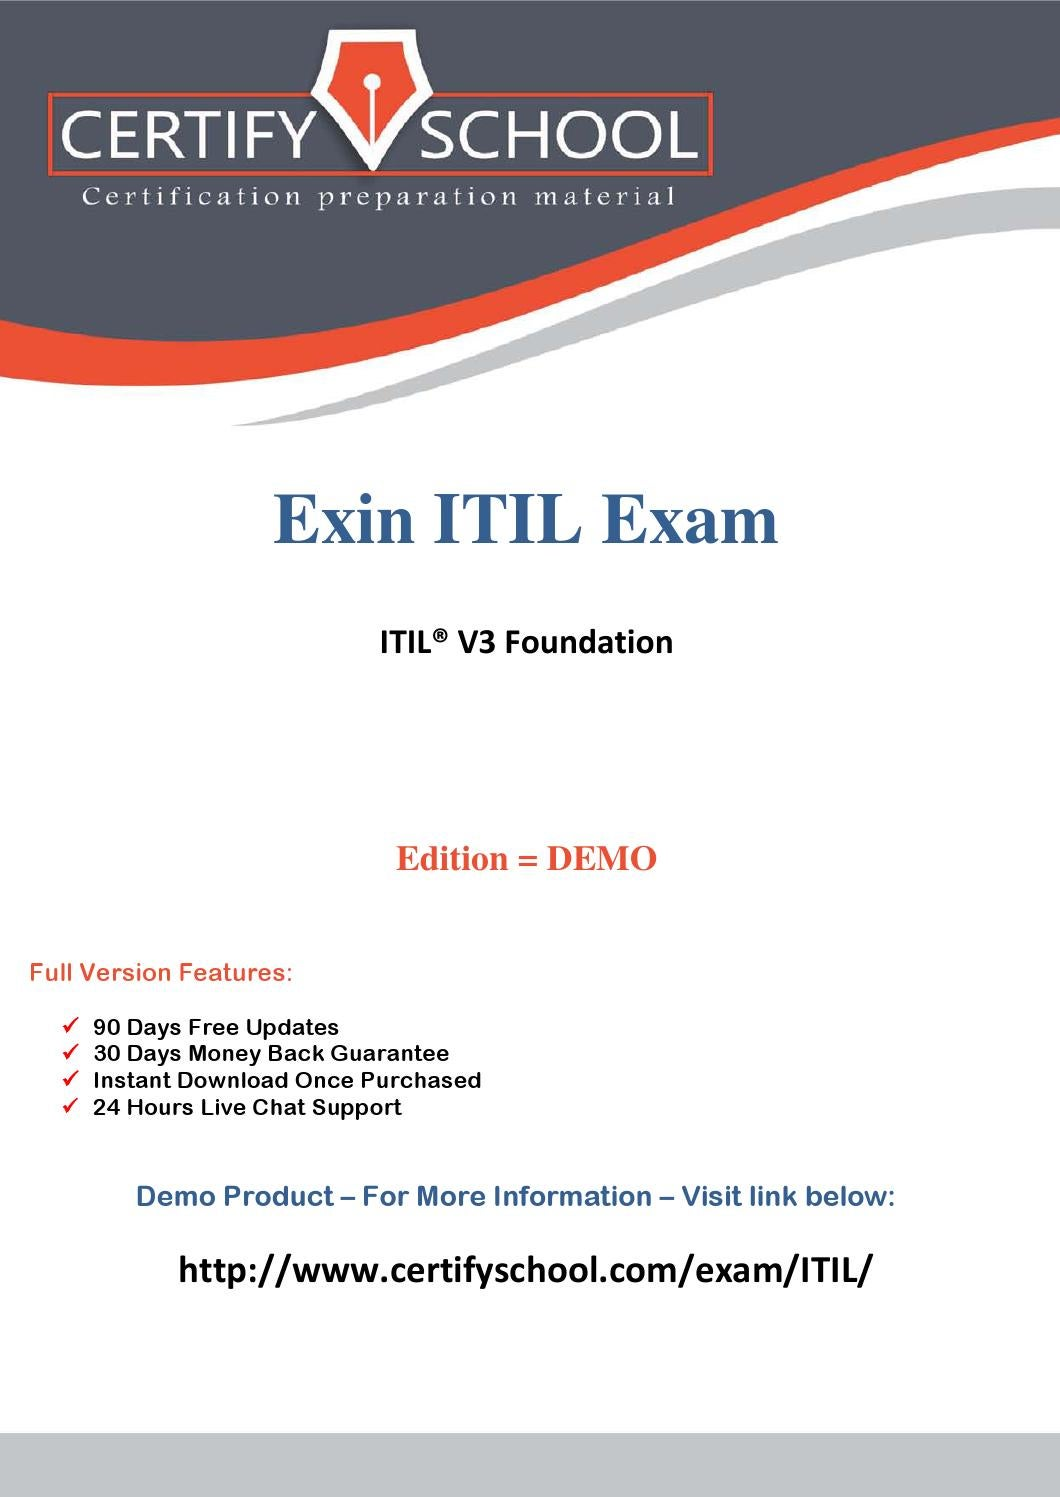 Itil certifyschool exam actual questions pdf by andrew mosley itil certifyschool exam actual questions pdf by andrew mosley issuu xflitez Gallery